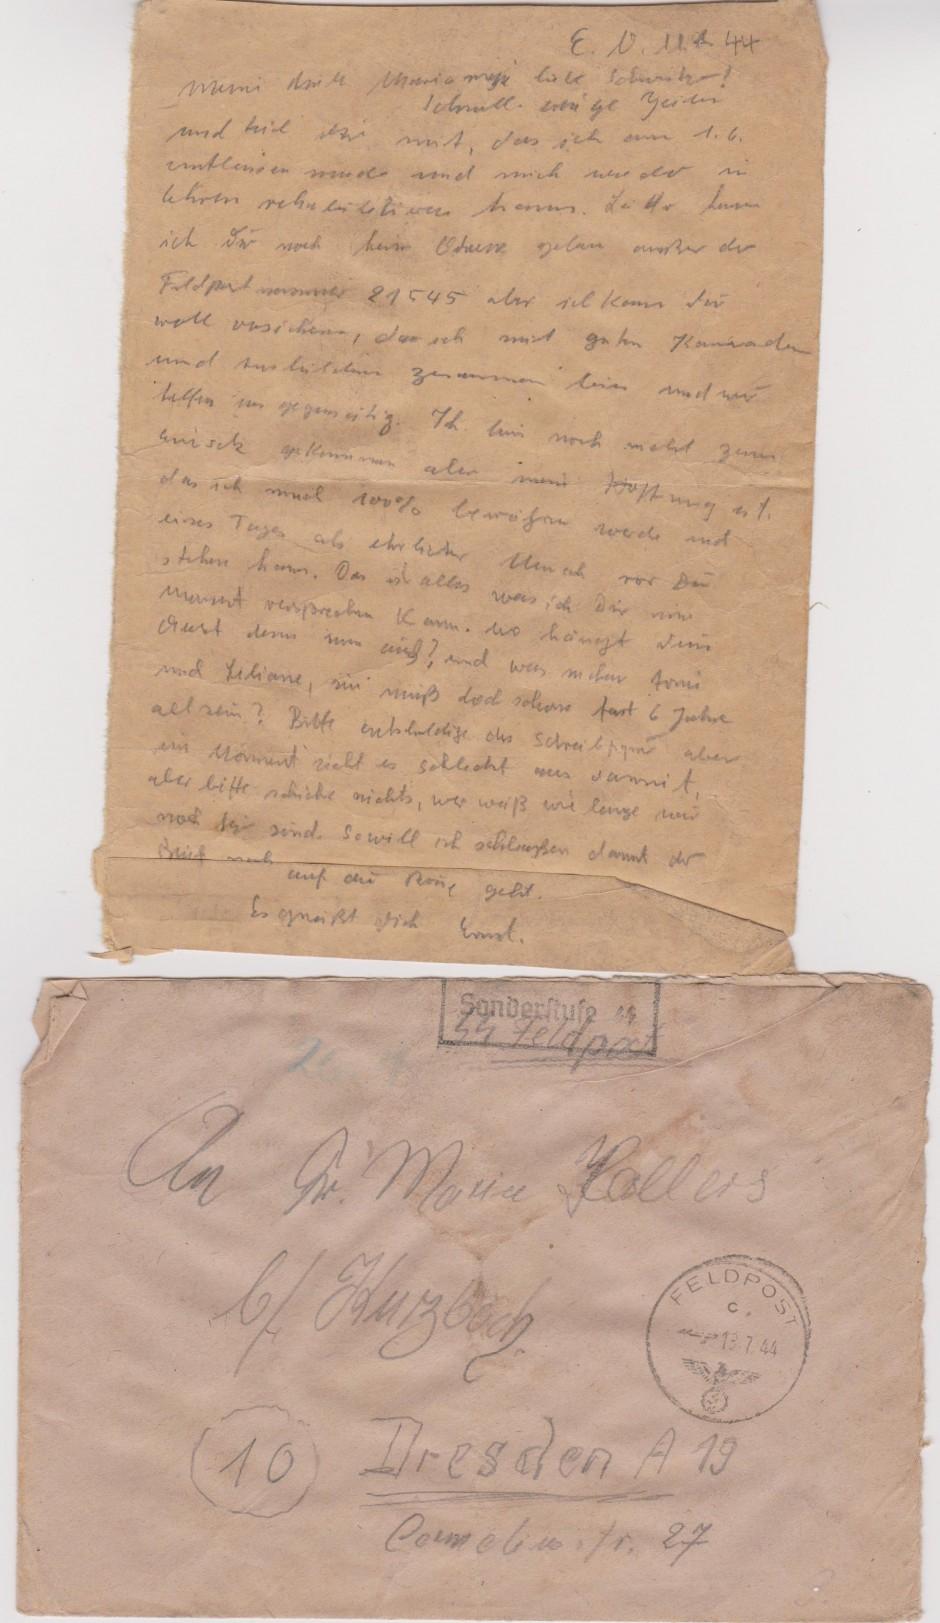 Sonderkommando Letter July 11 1944